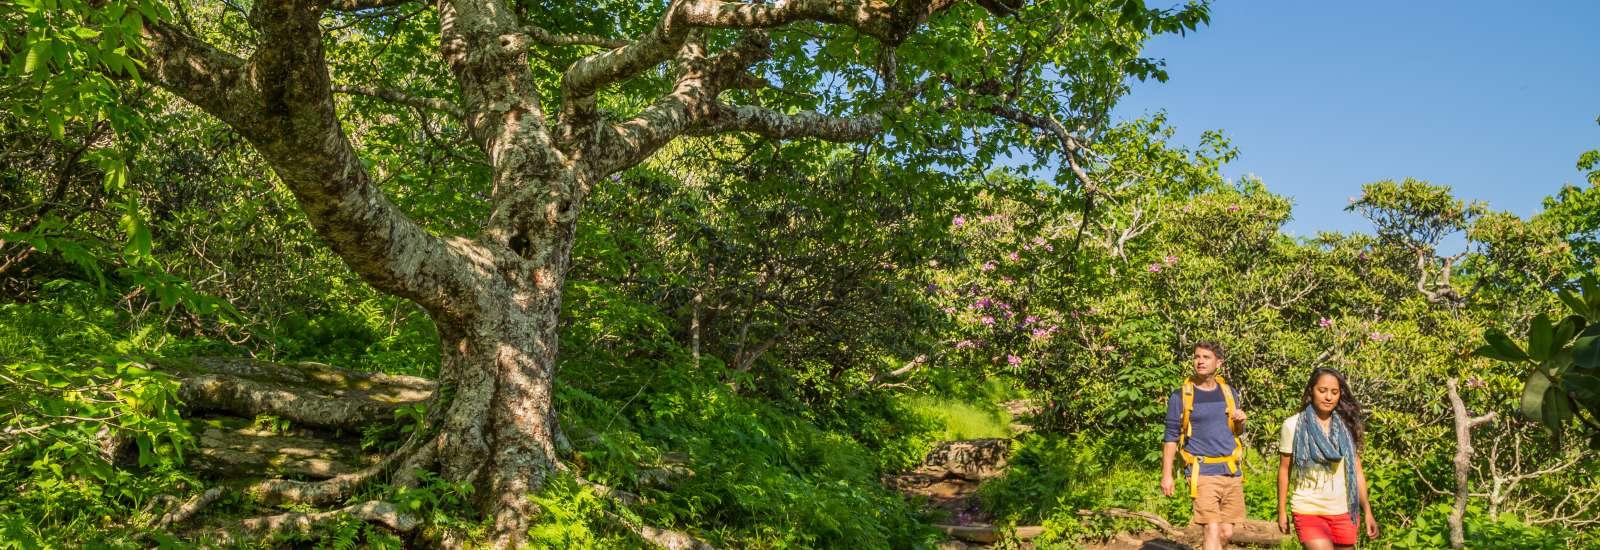 Craggy Gardens Hiking